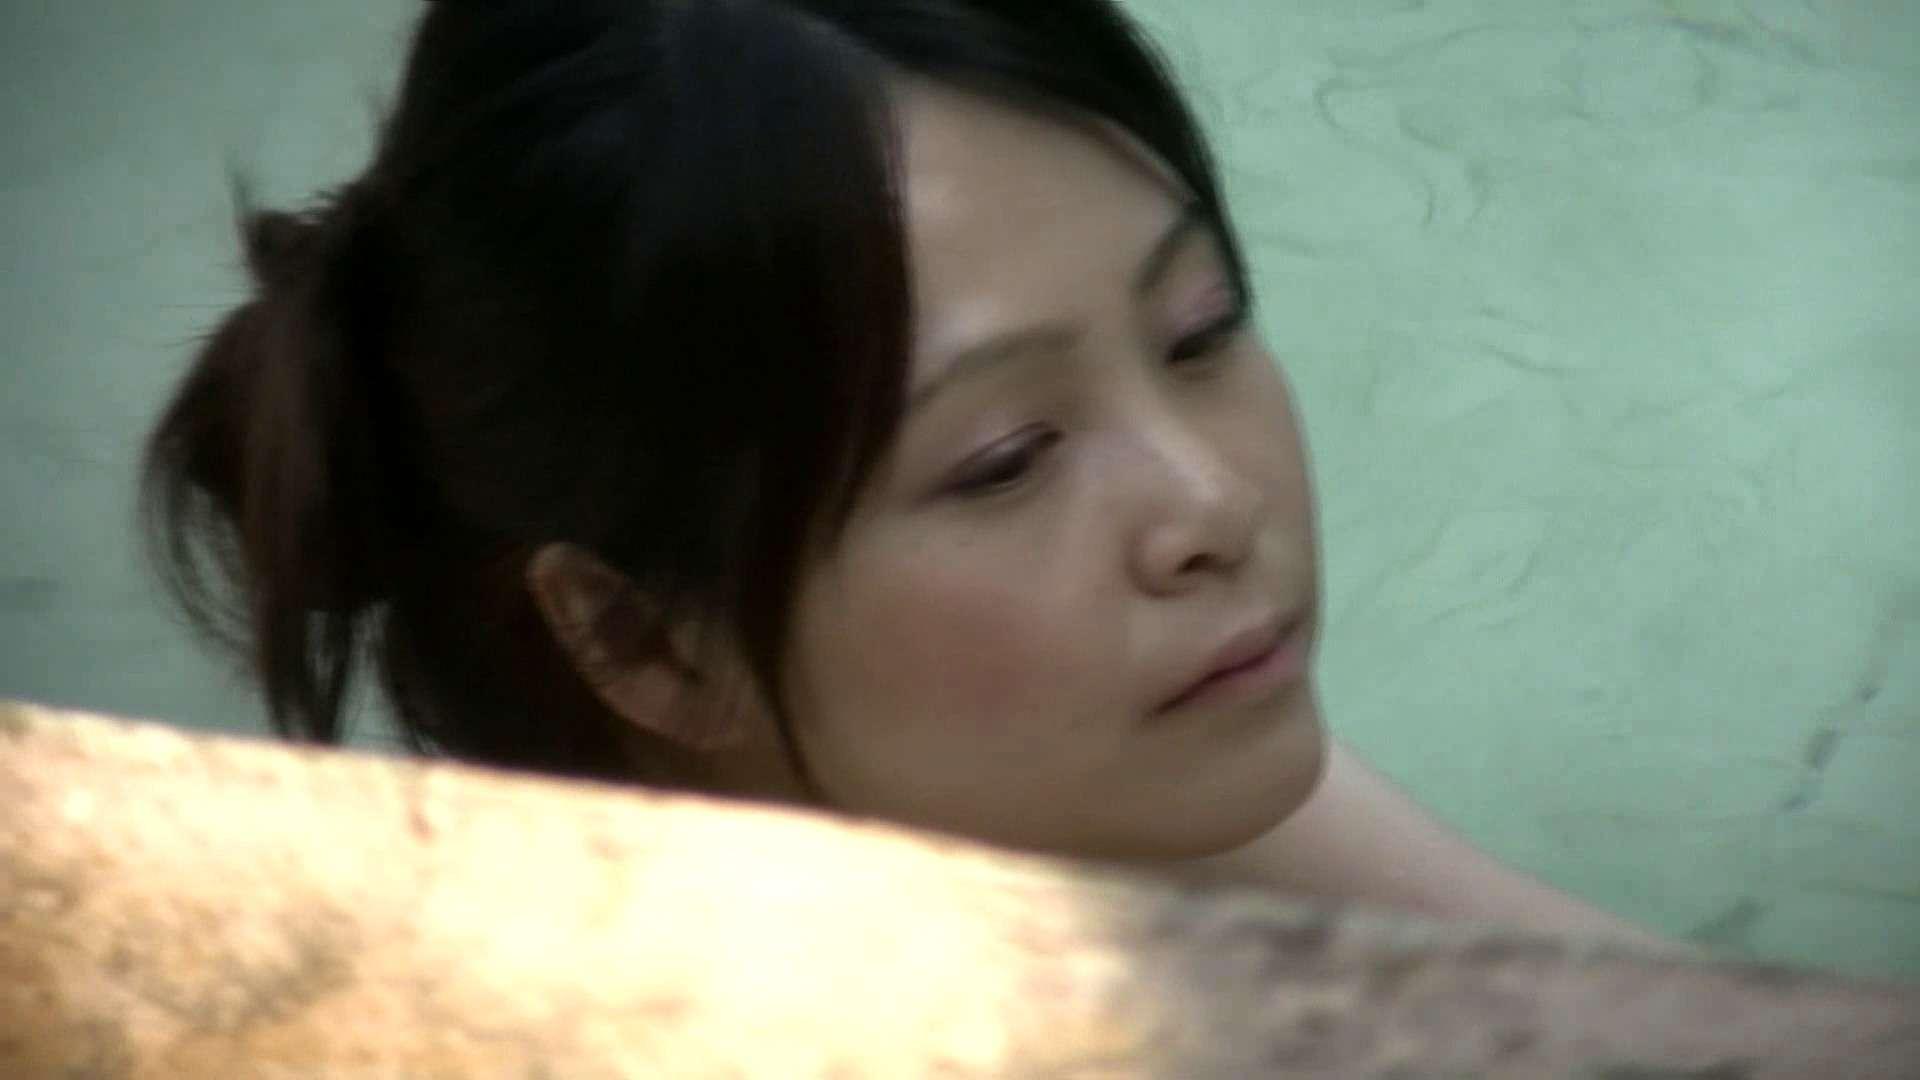 Aquaな露天風呂Vol.652 盗撮 | HなOL  105pic 14